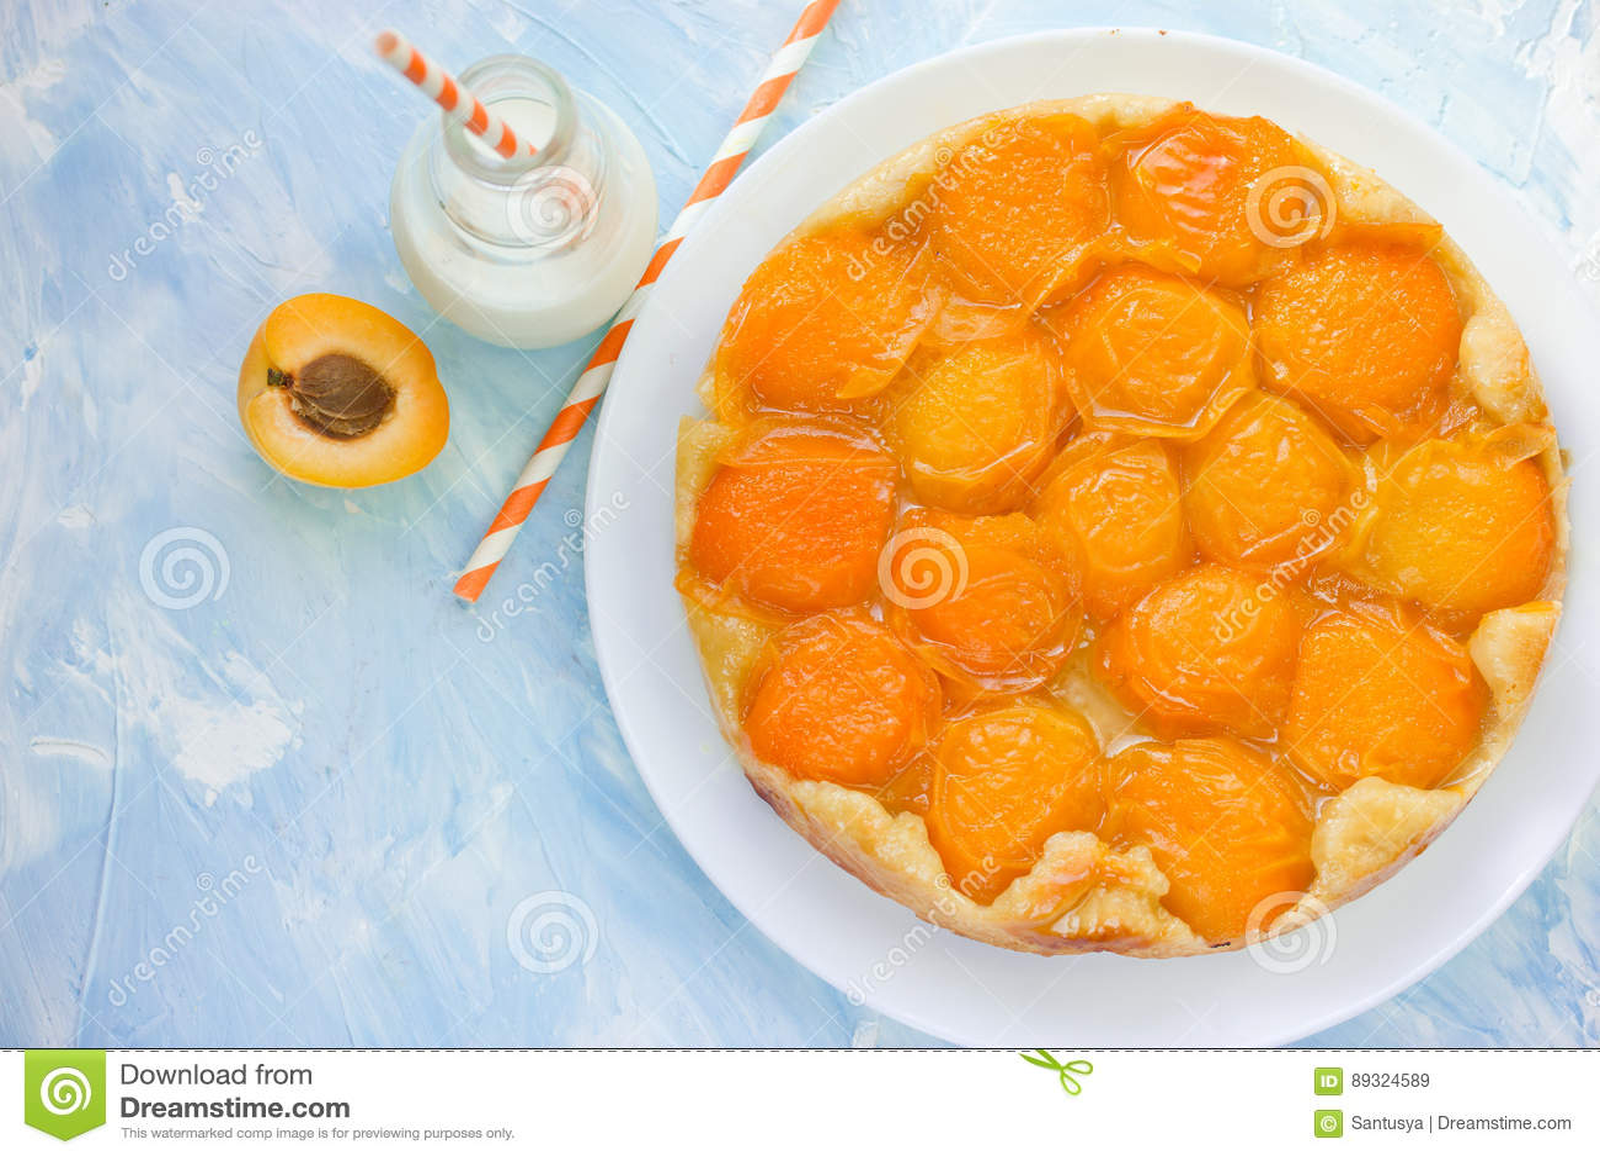 Apricot Tarte Tatin Stock Photo - Image: 89324589